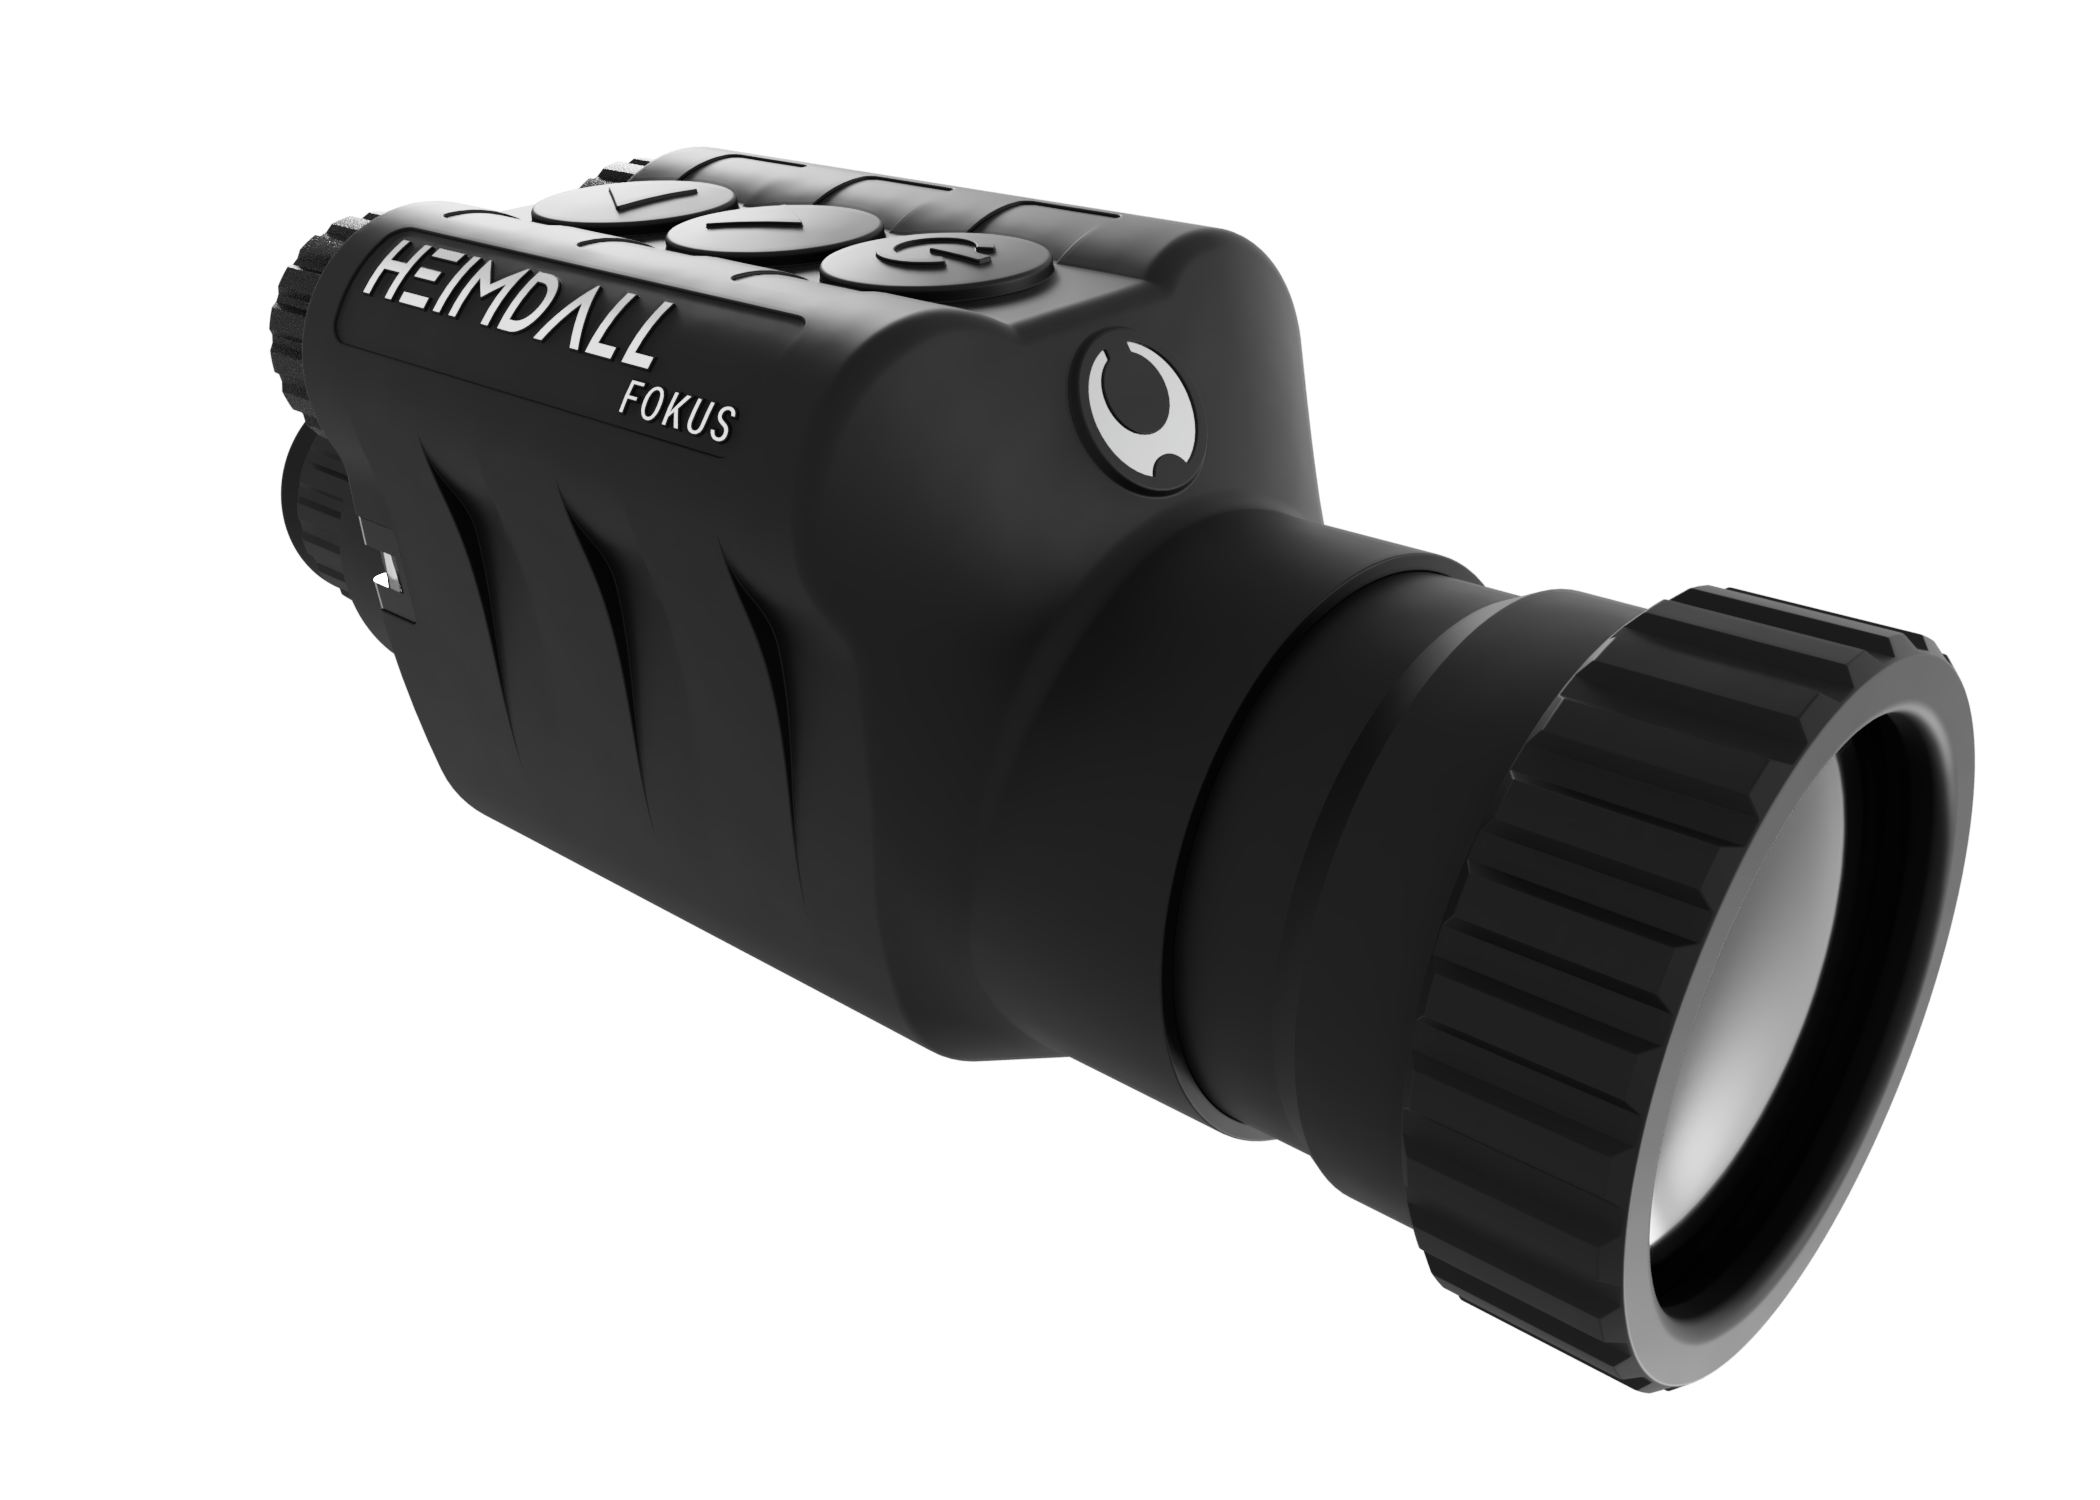 Heimdall Fokus 50 2.0 - Dual-Use Wärmebildvorsatzgerät